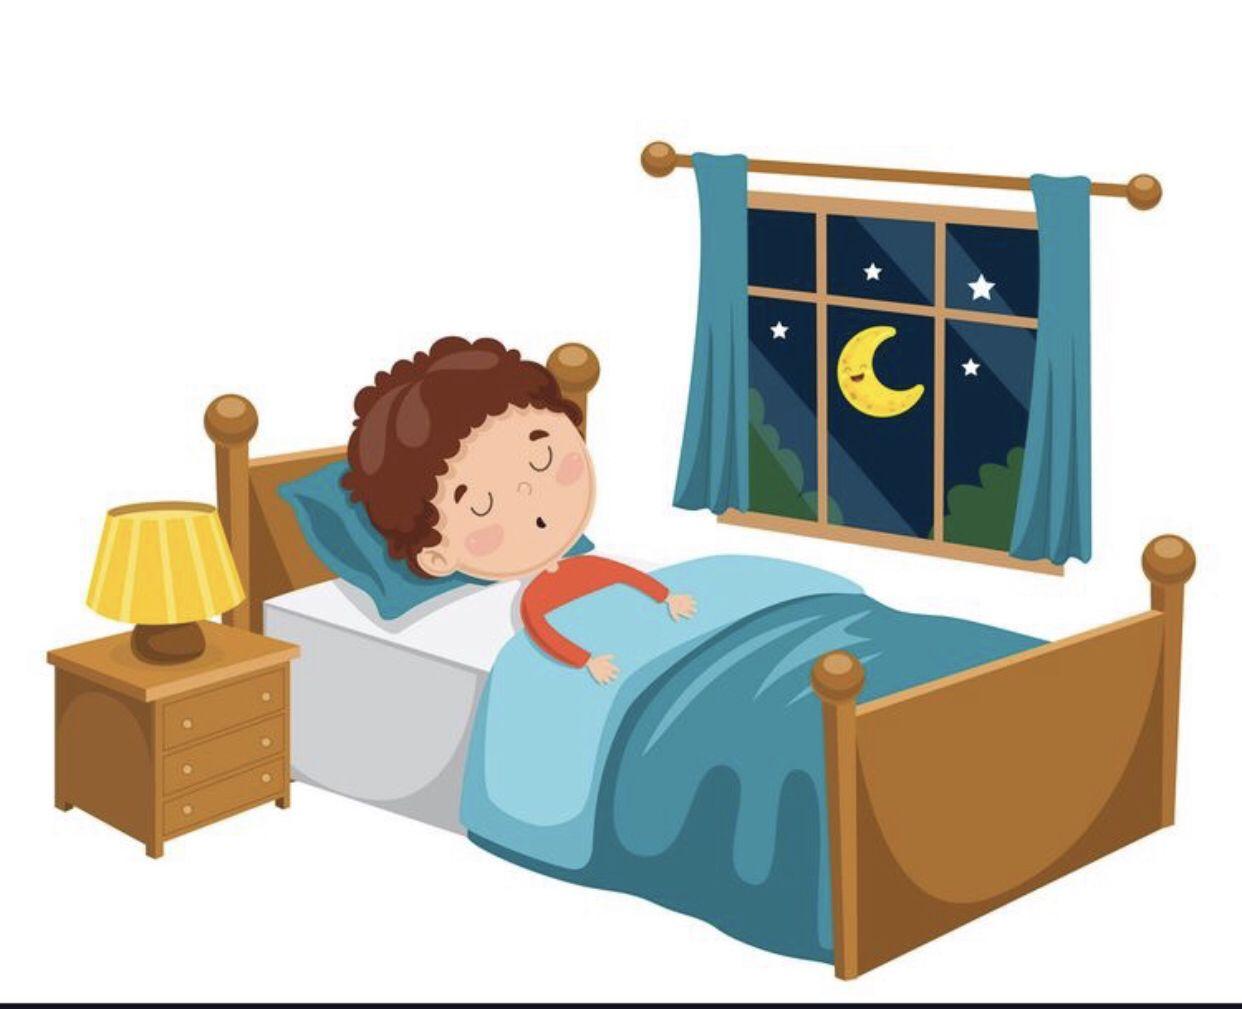 Pin By Kholoud Abu On قصص الحروف Girl Sleeping Sleeping In Bed Vector Free